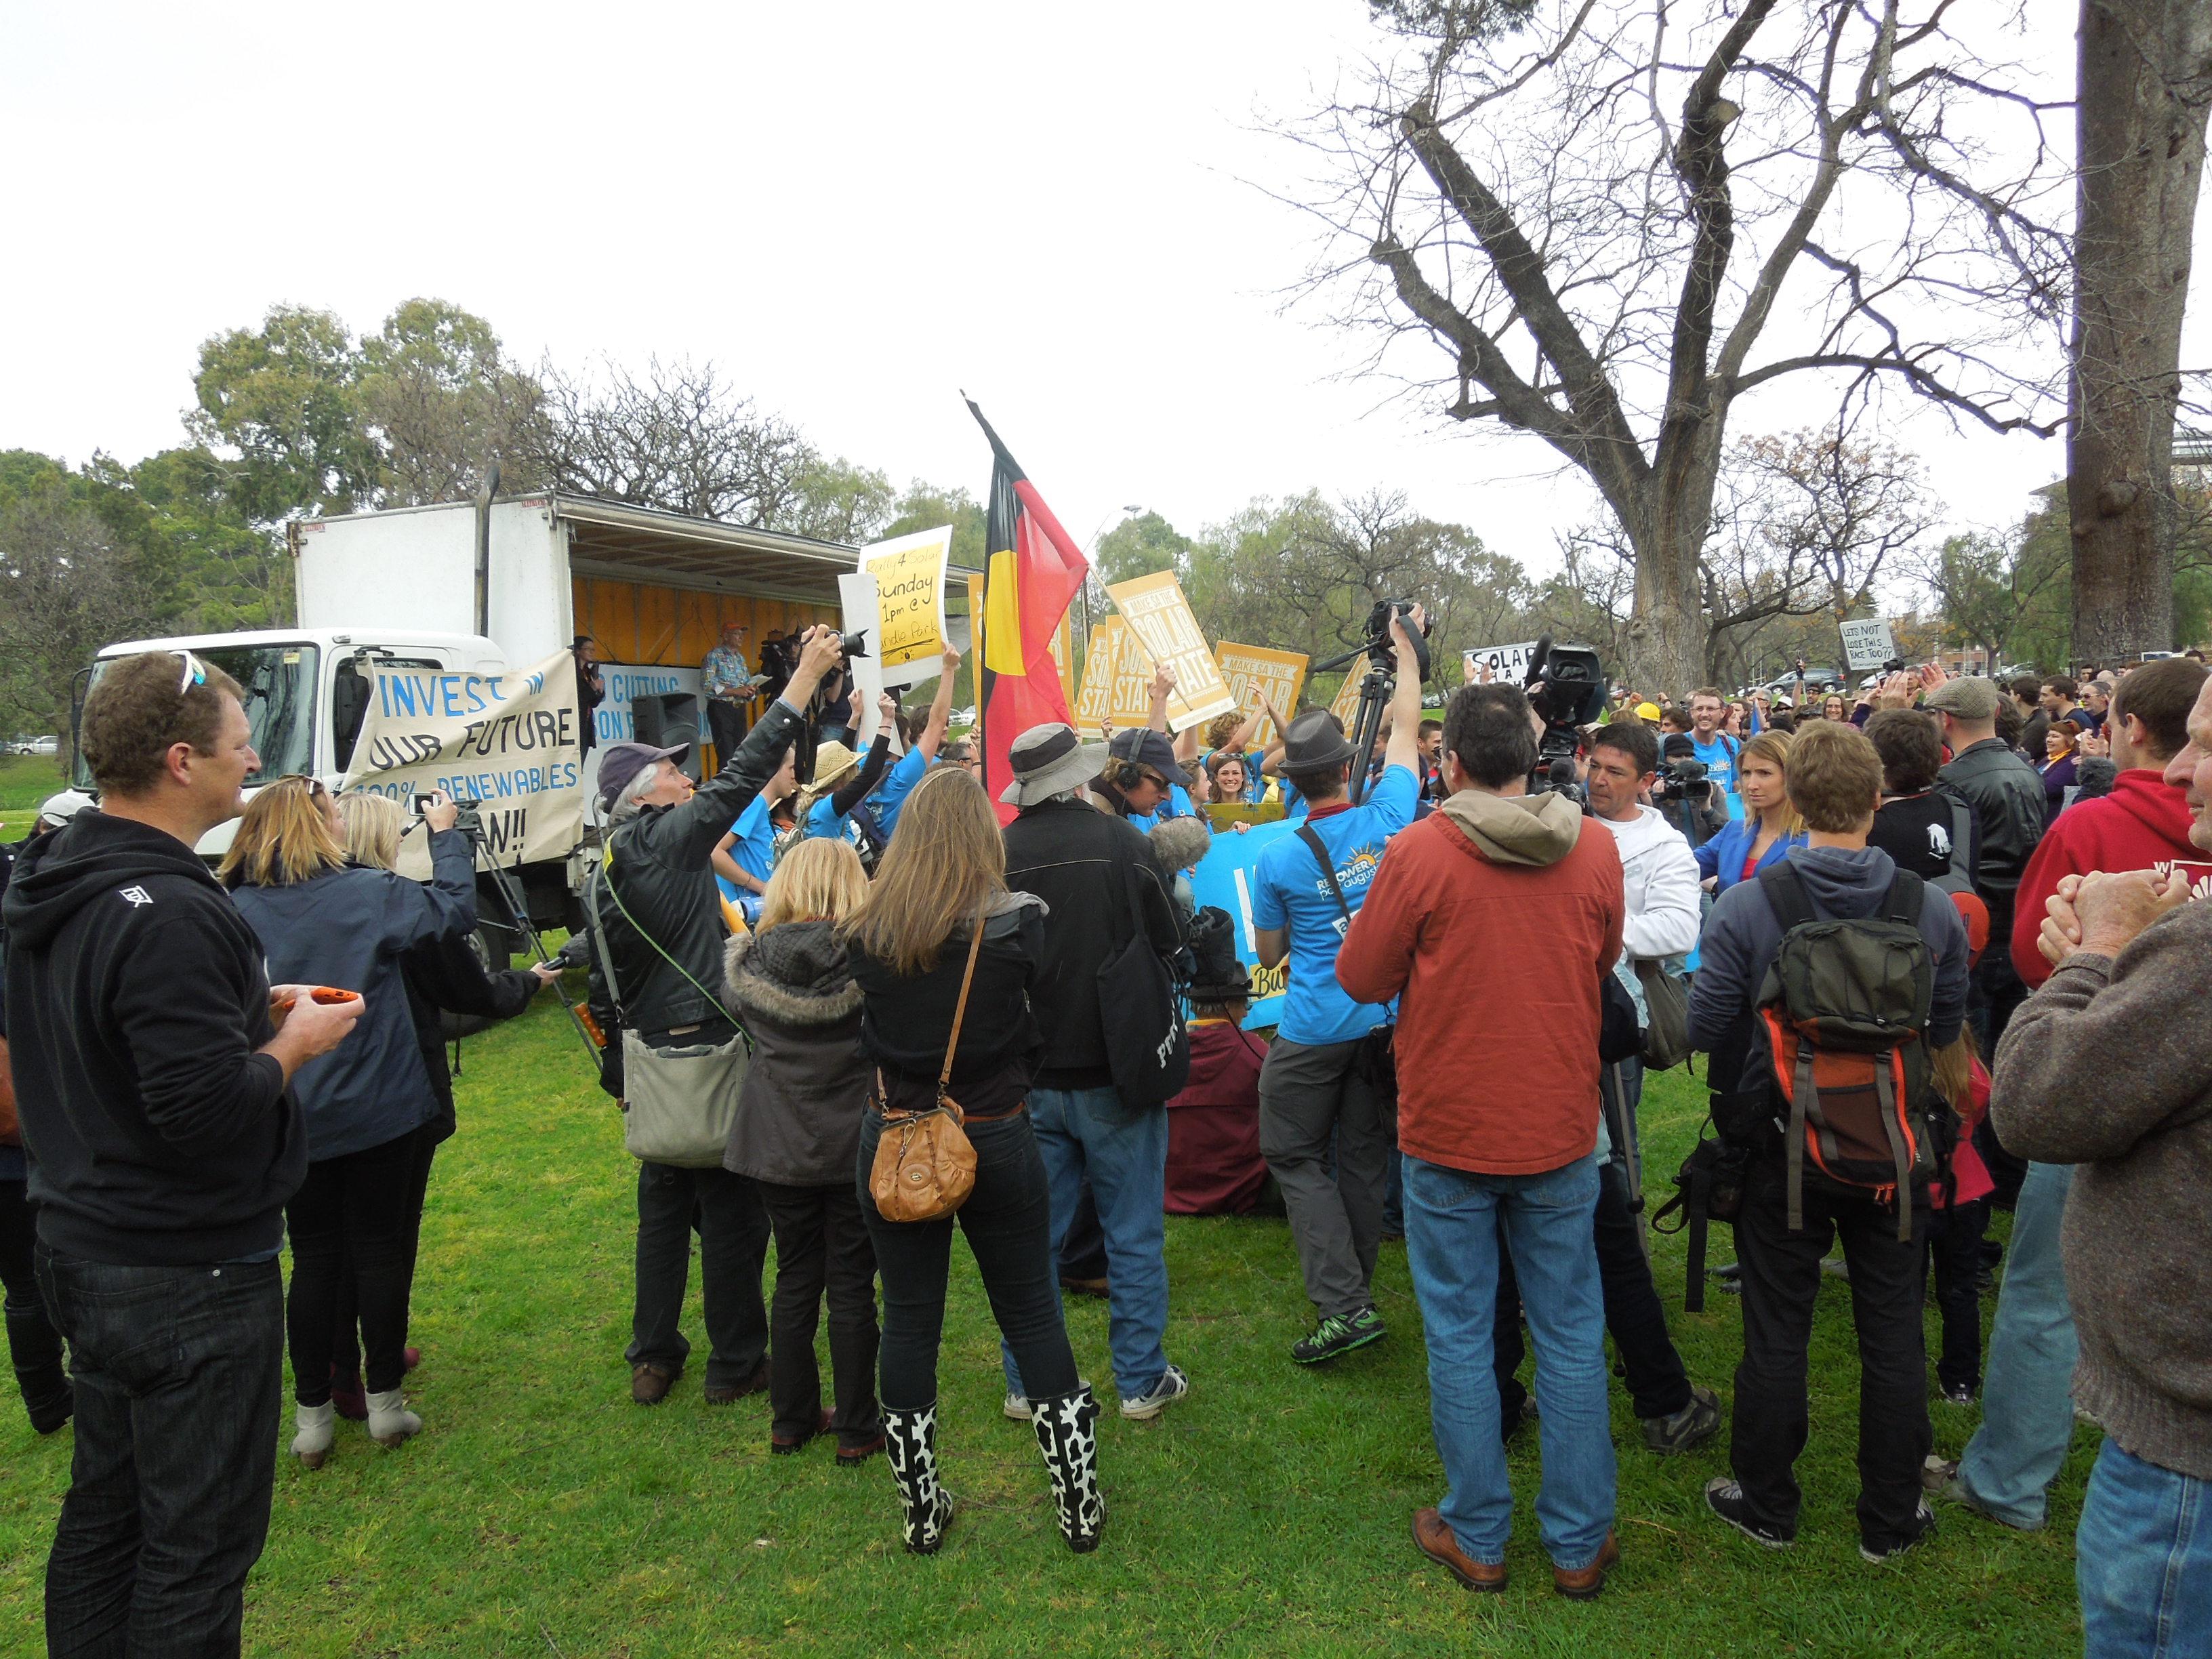 Repowering Port Augusta rally